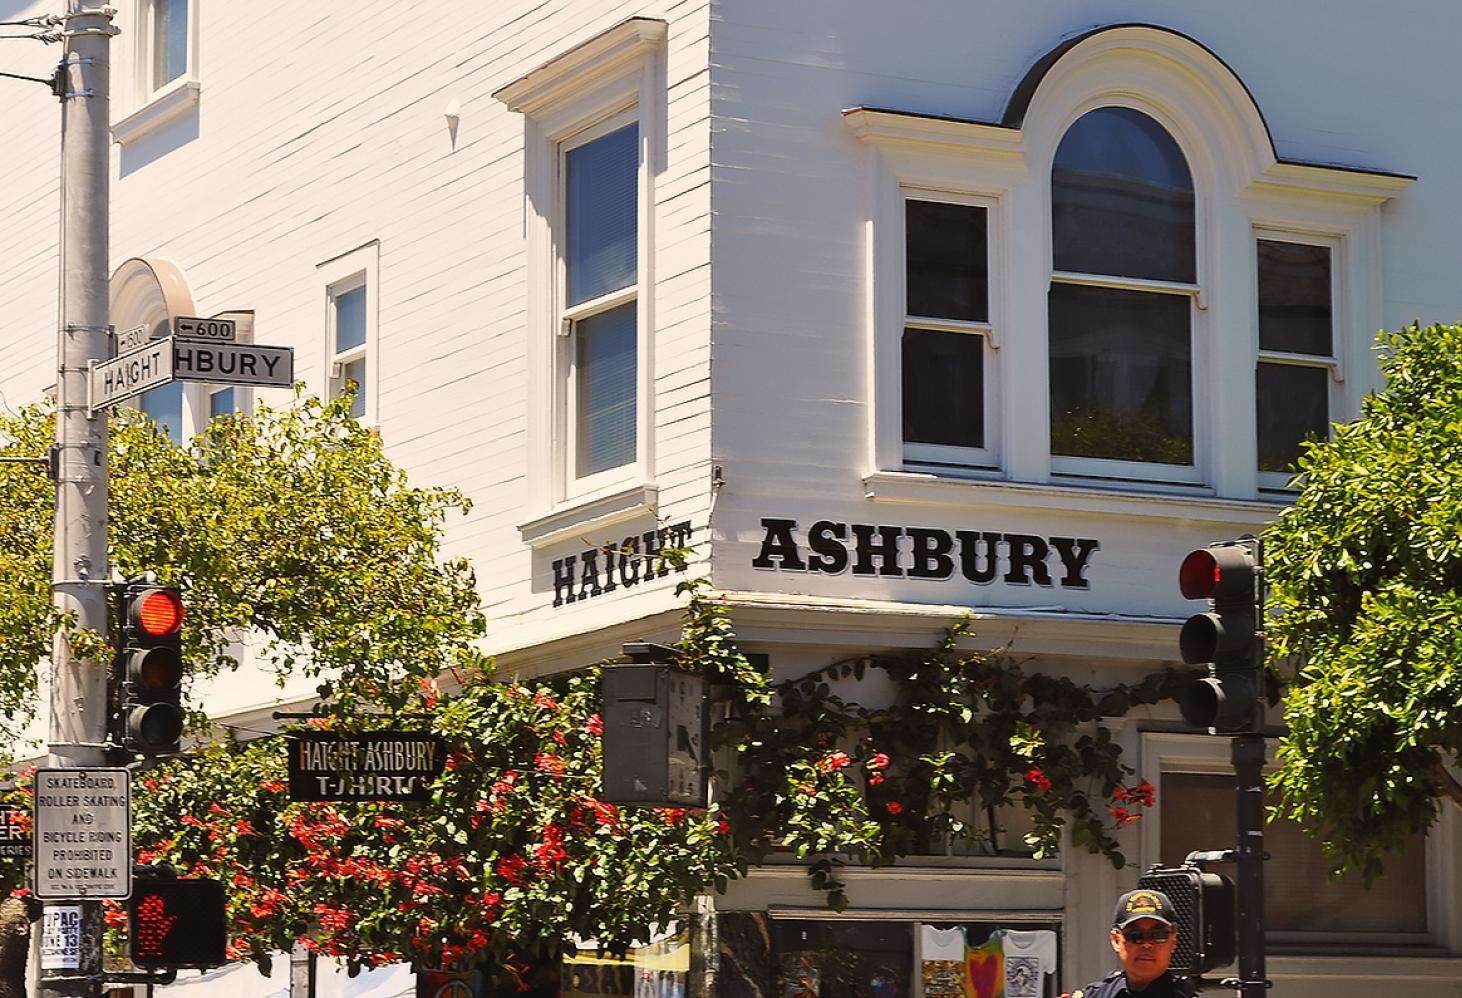 Хайт-Эшбери, Сан-Франциско, Калифорния